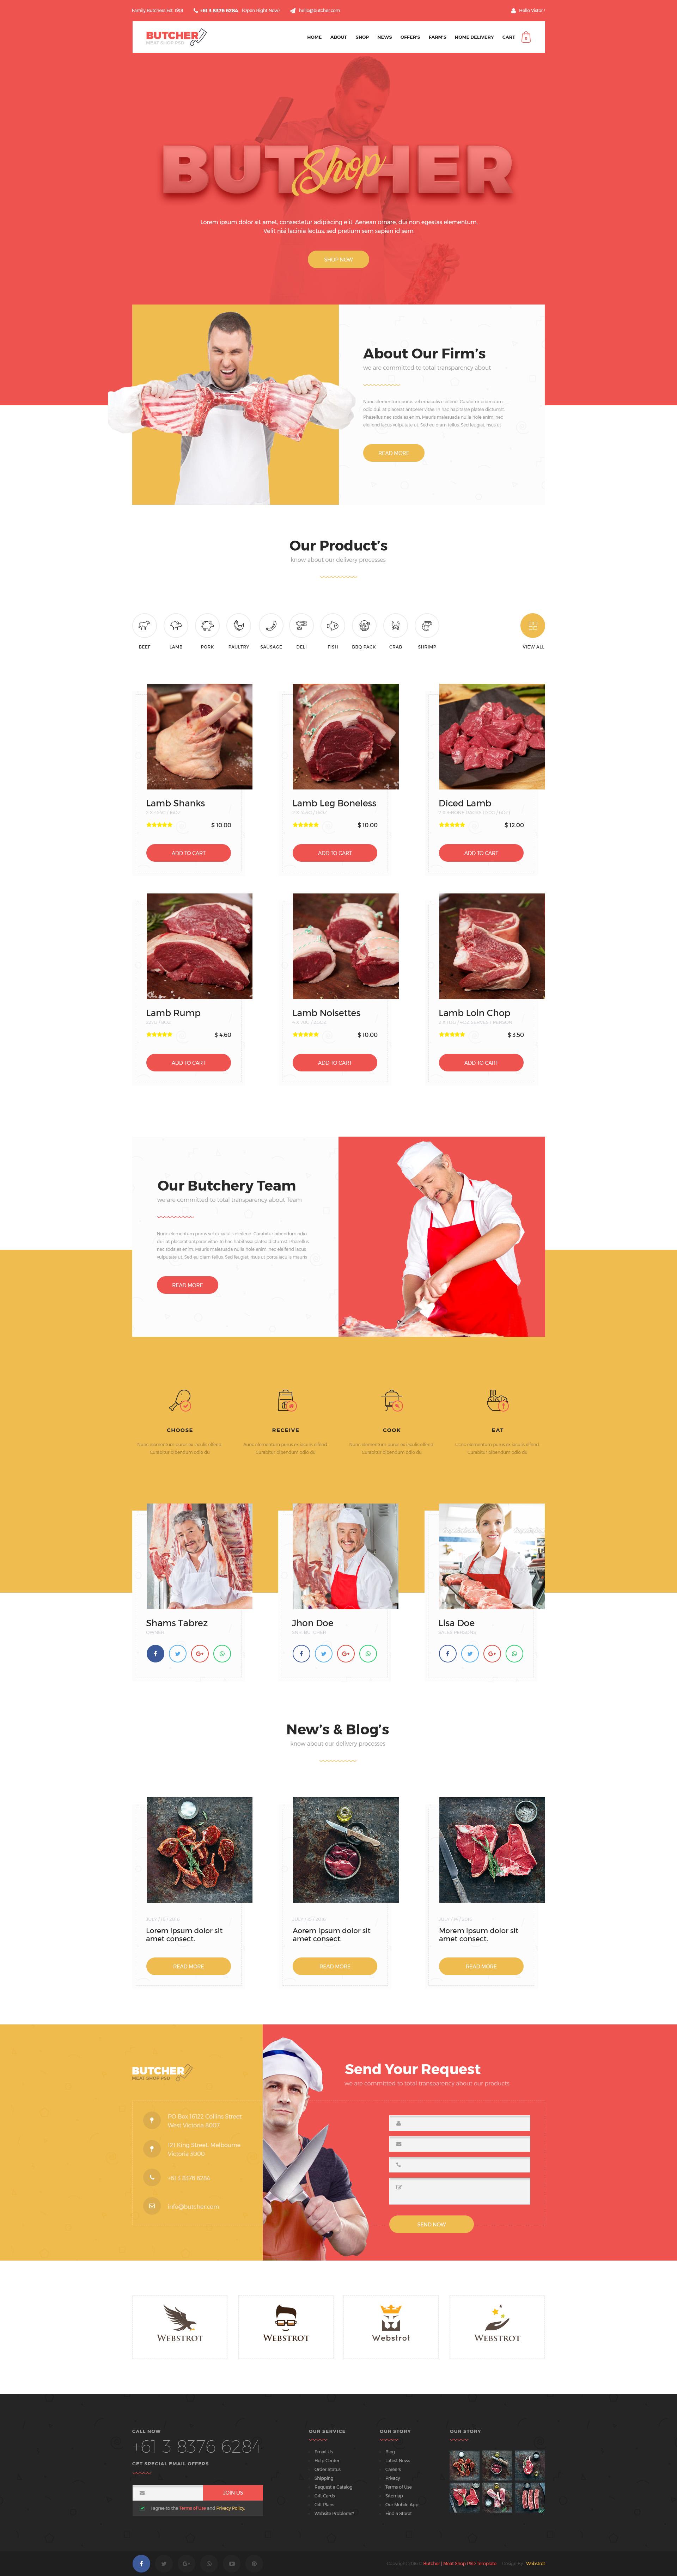 Butcher - Meat Shop eCommerce OpenCart Theme - 1